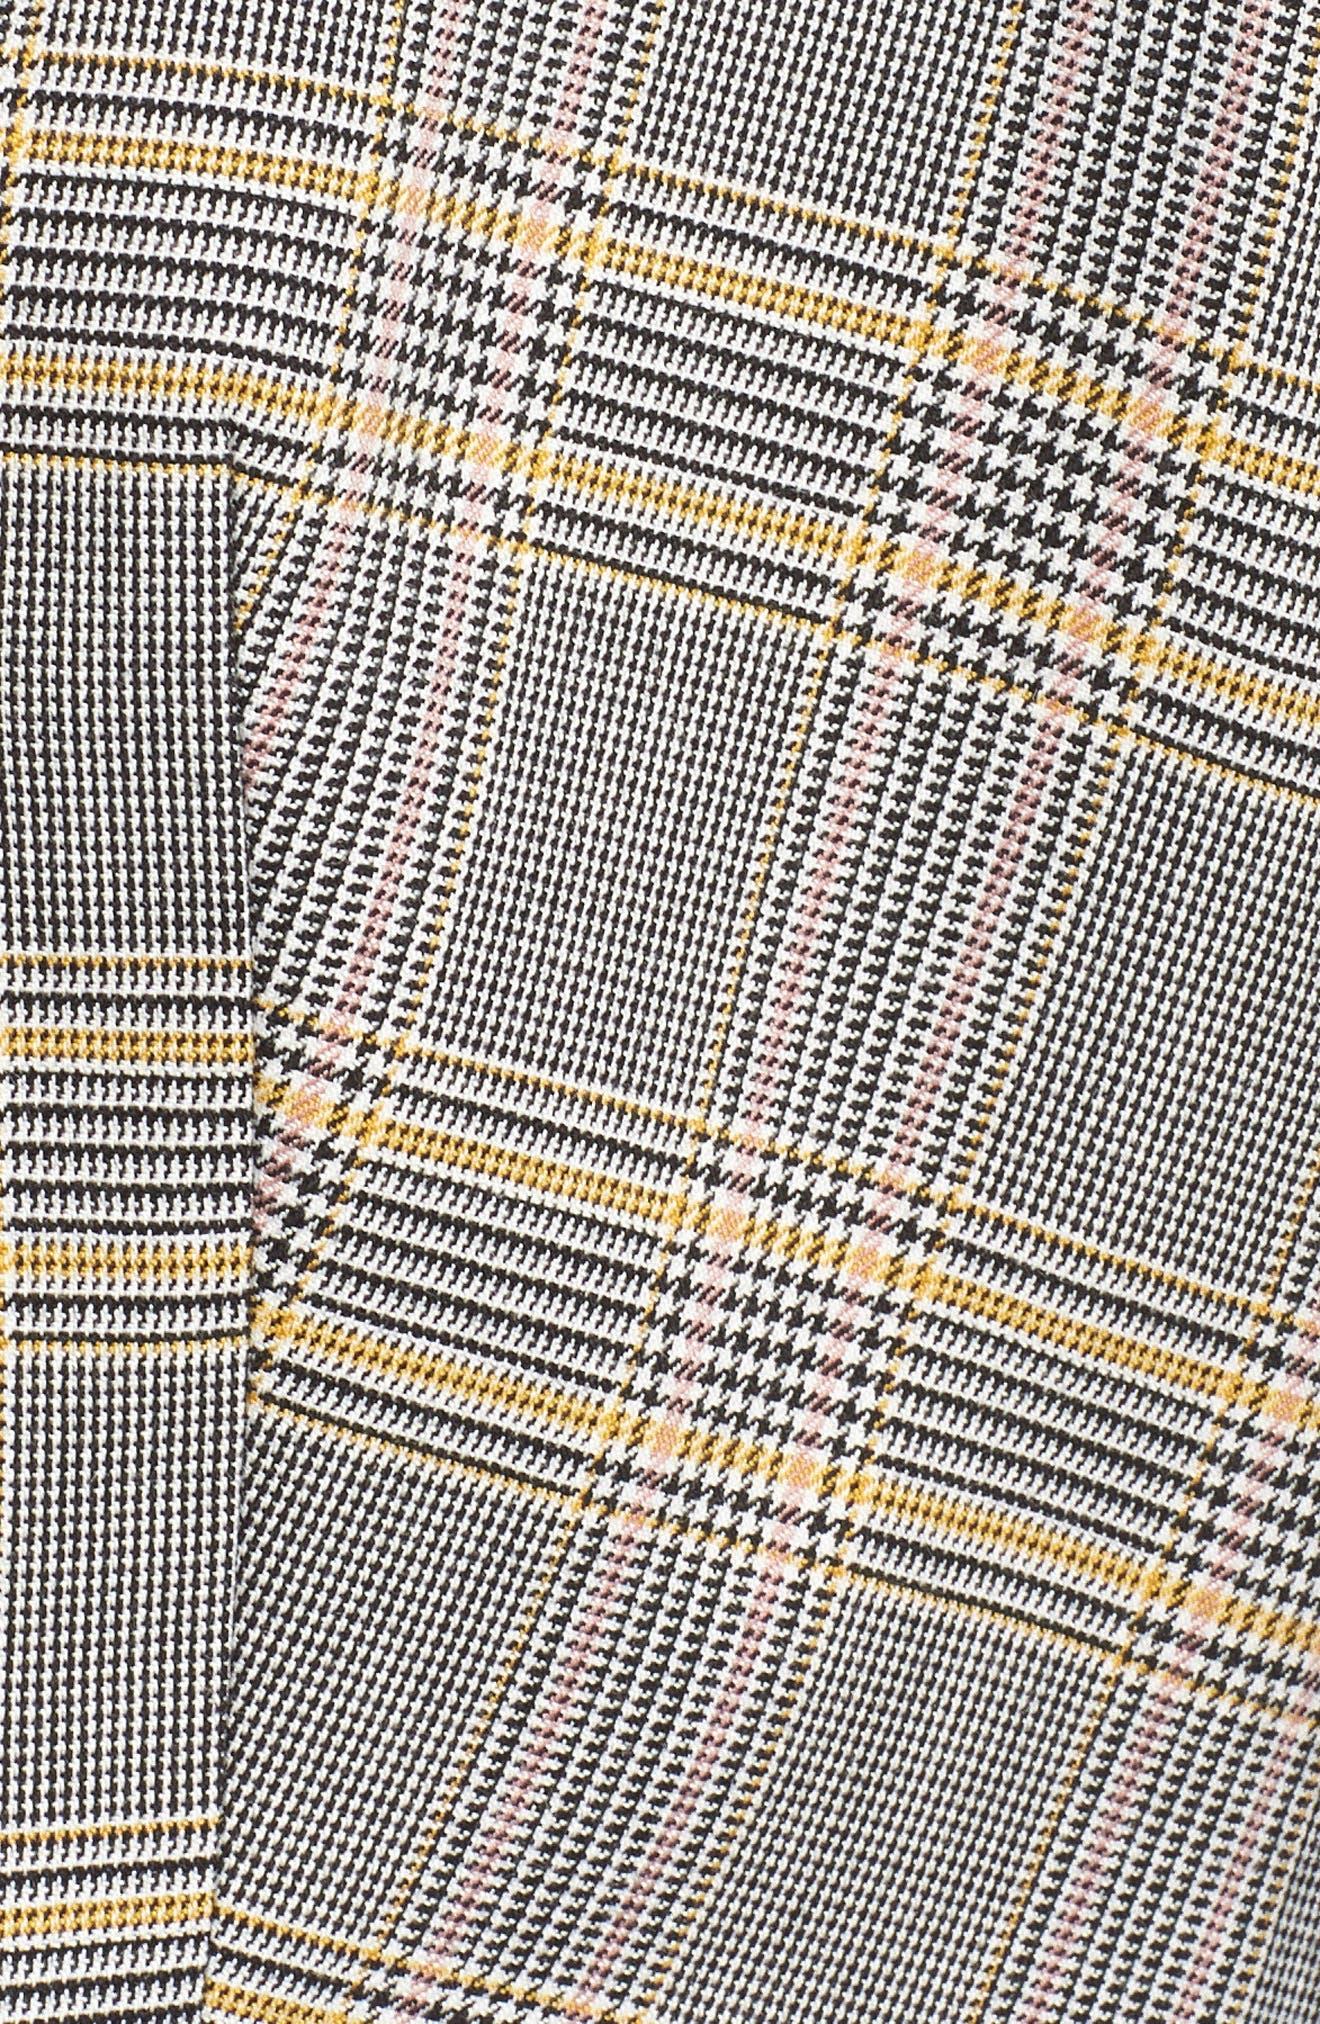 Plaid Ruched Sleeve Blazer,                             Alternate thumbnail 6, color,                             RICH BLACK